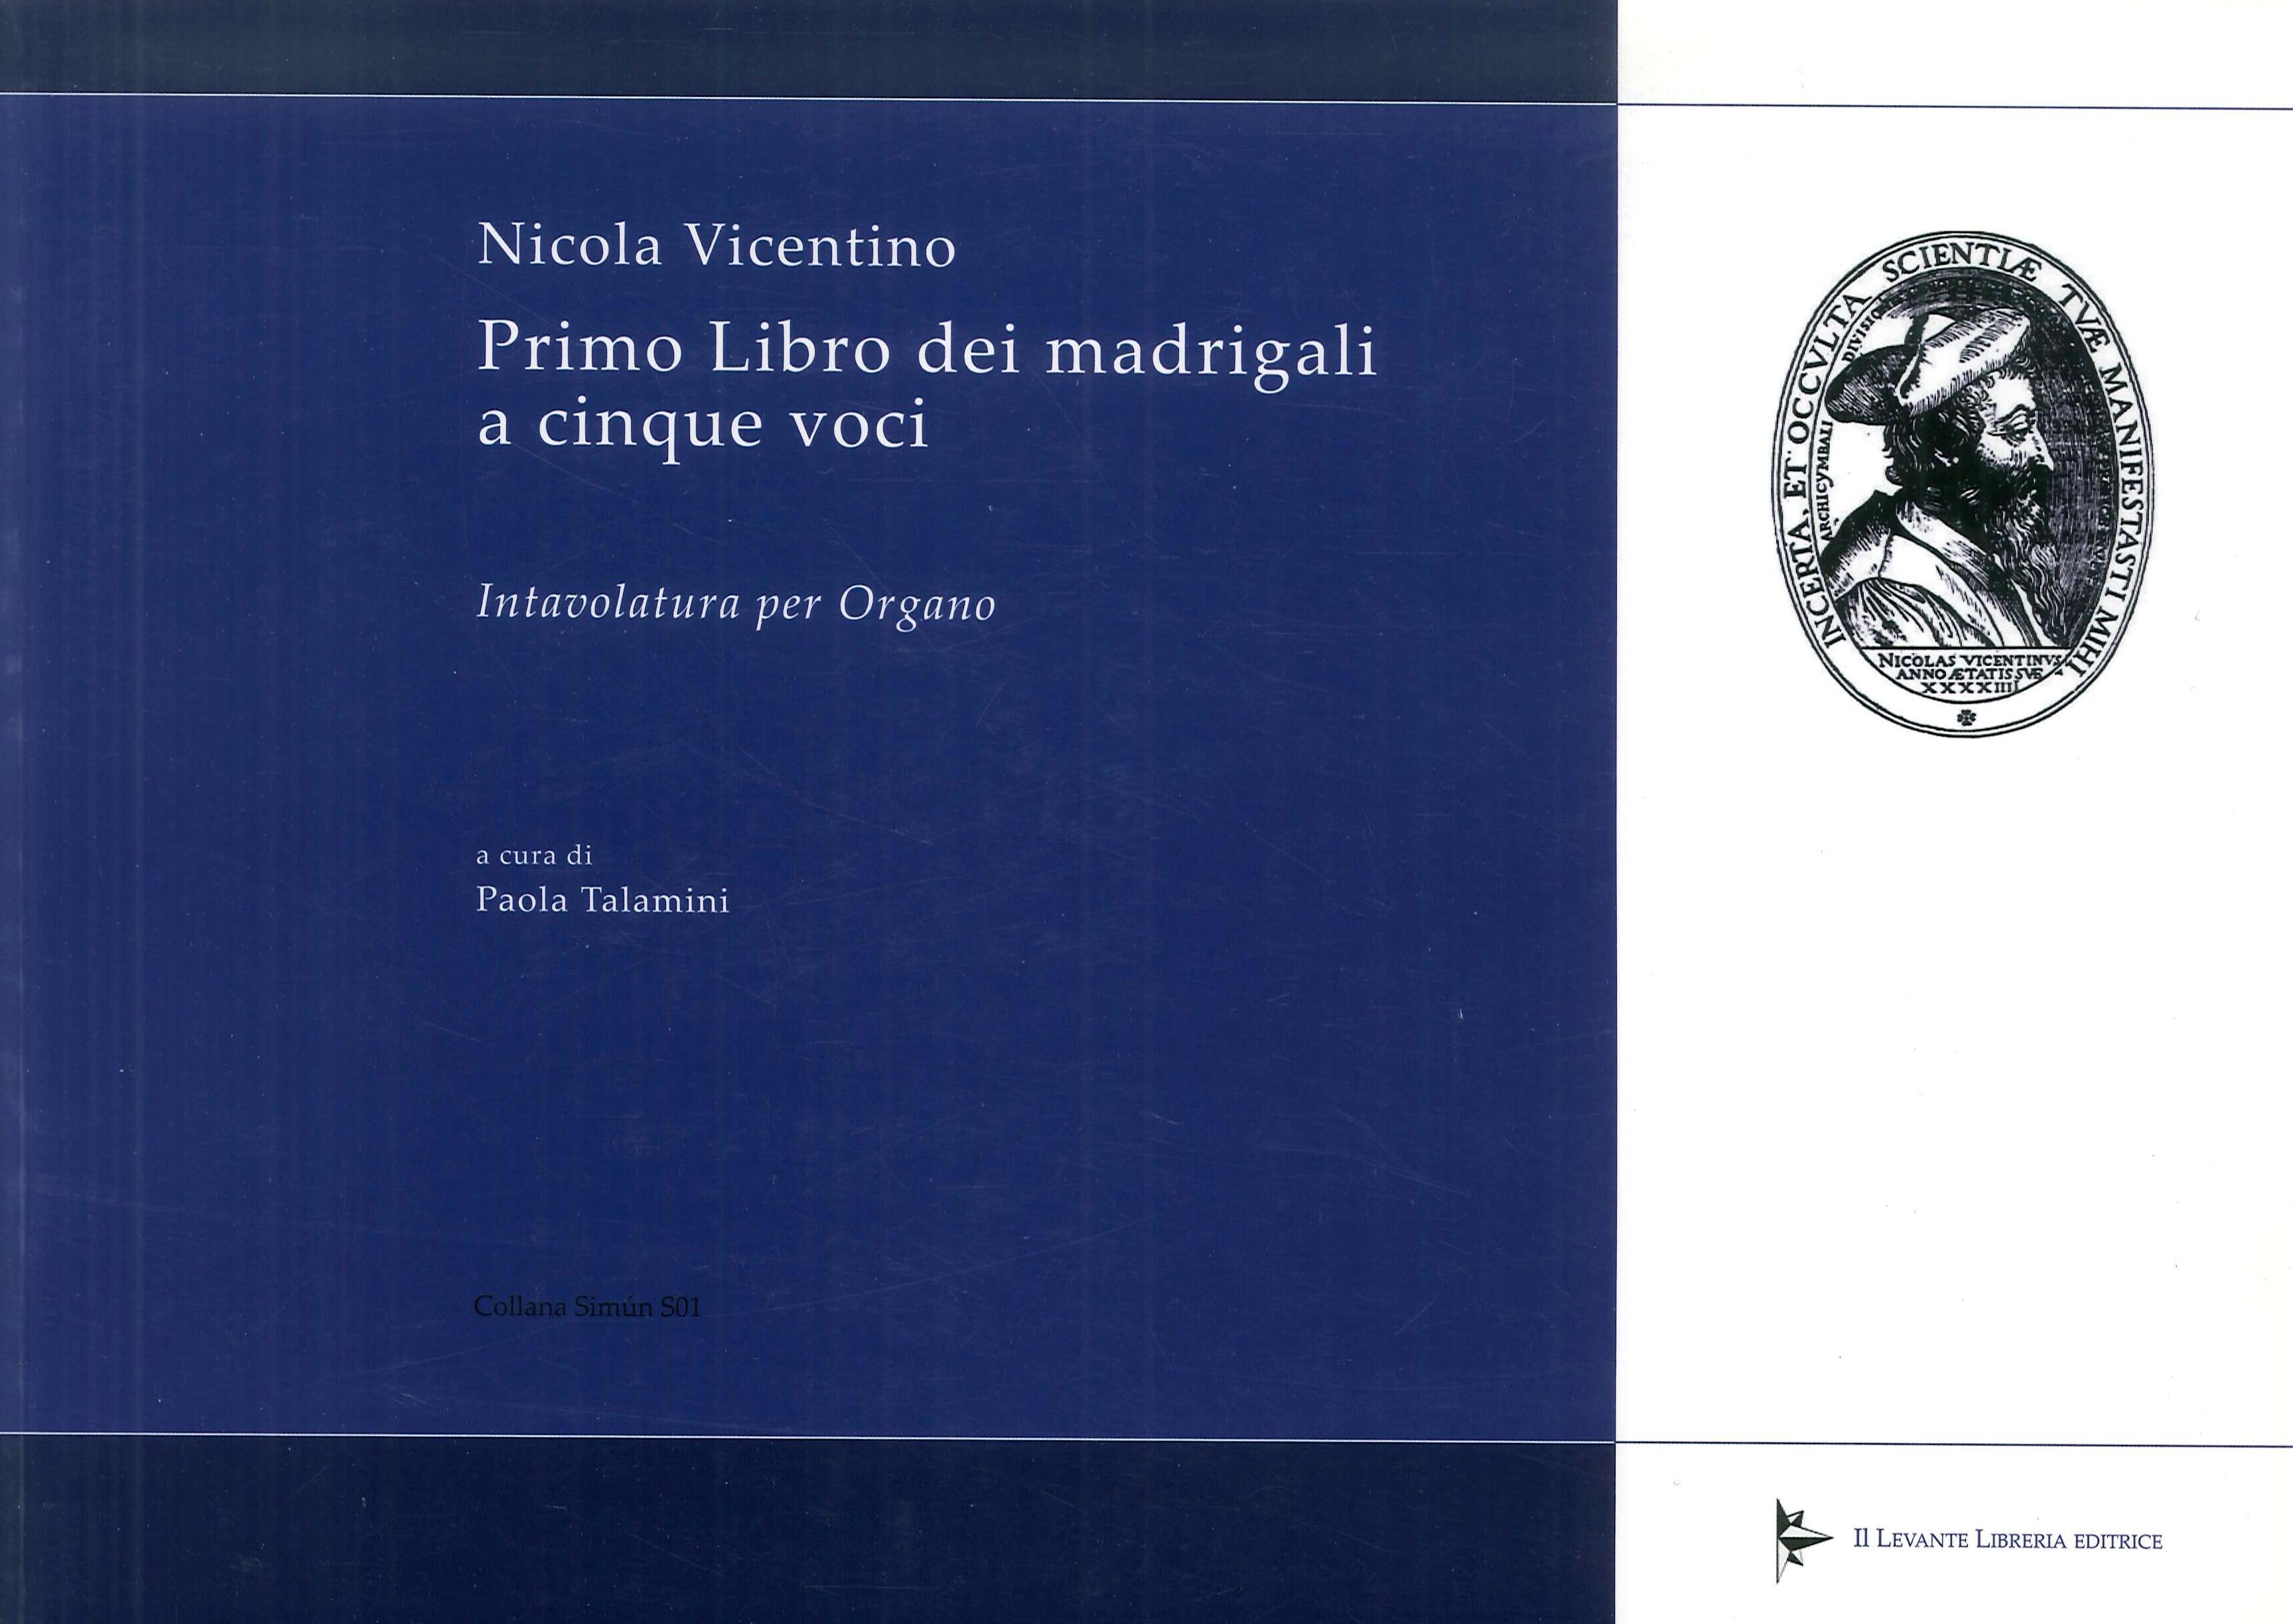 Primo libro dei madrigali a cinque voci. Intavolatura per organo.